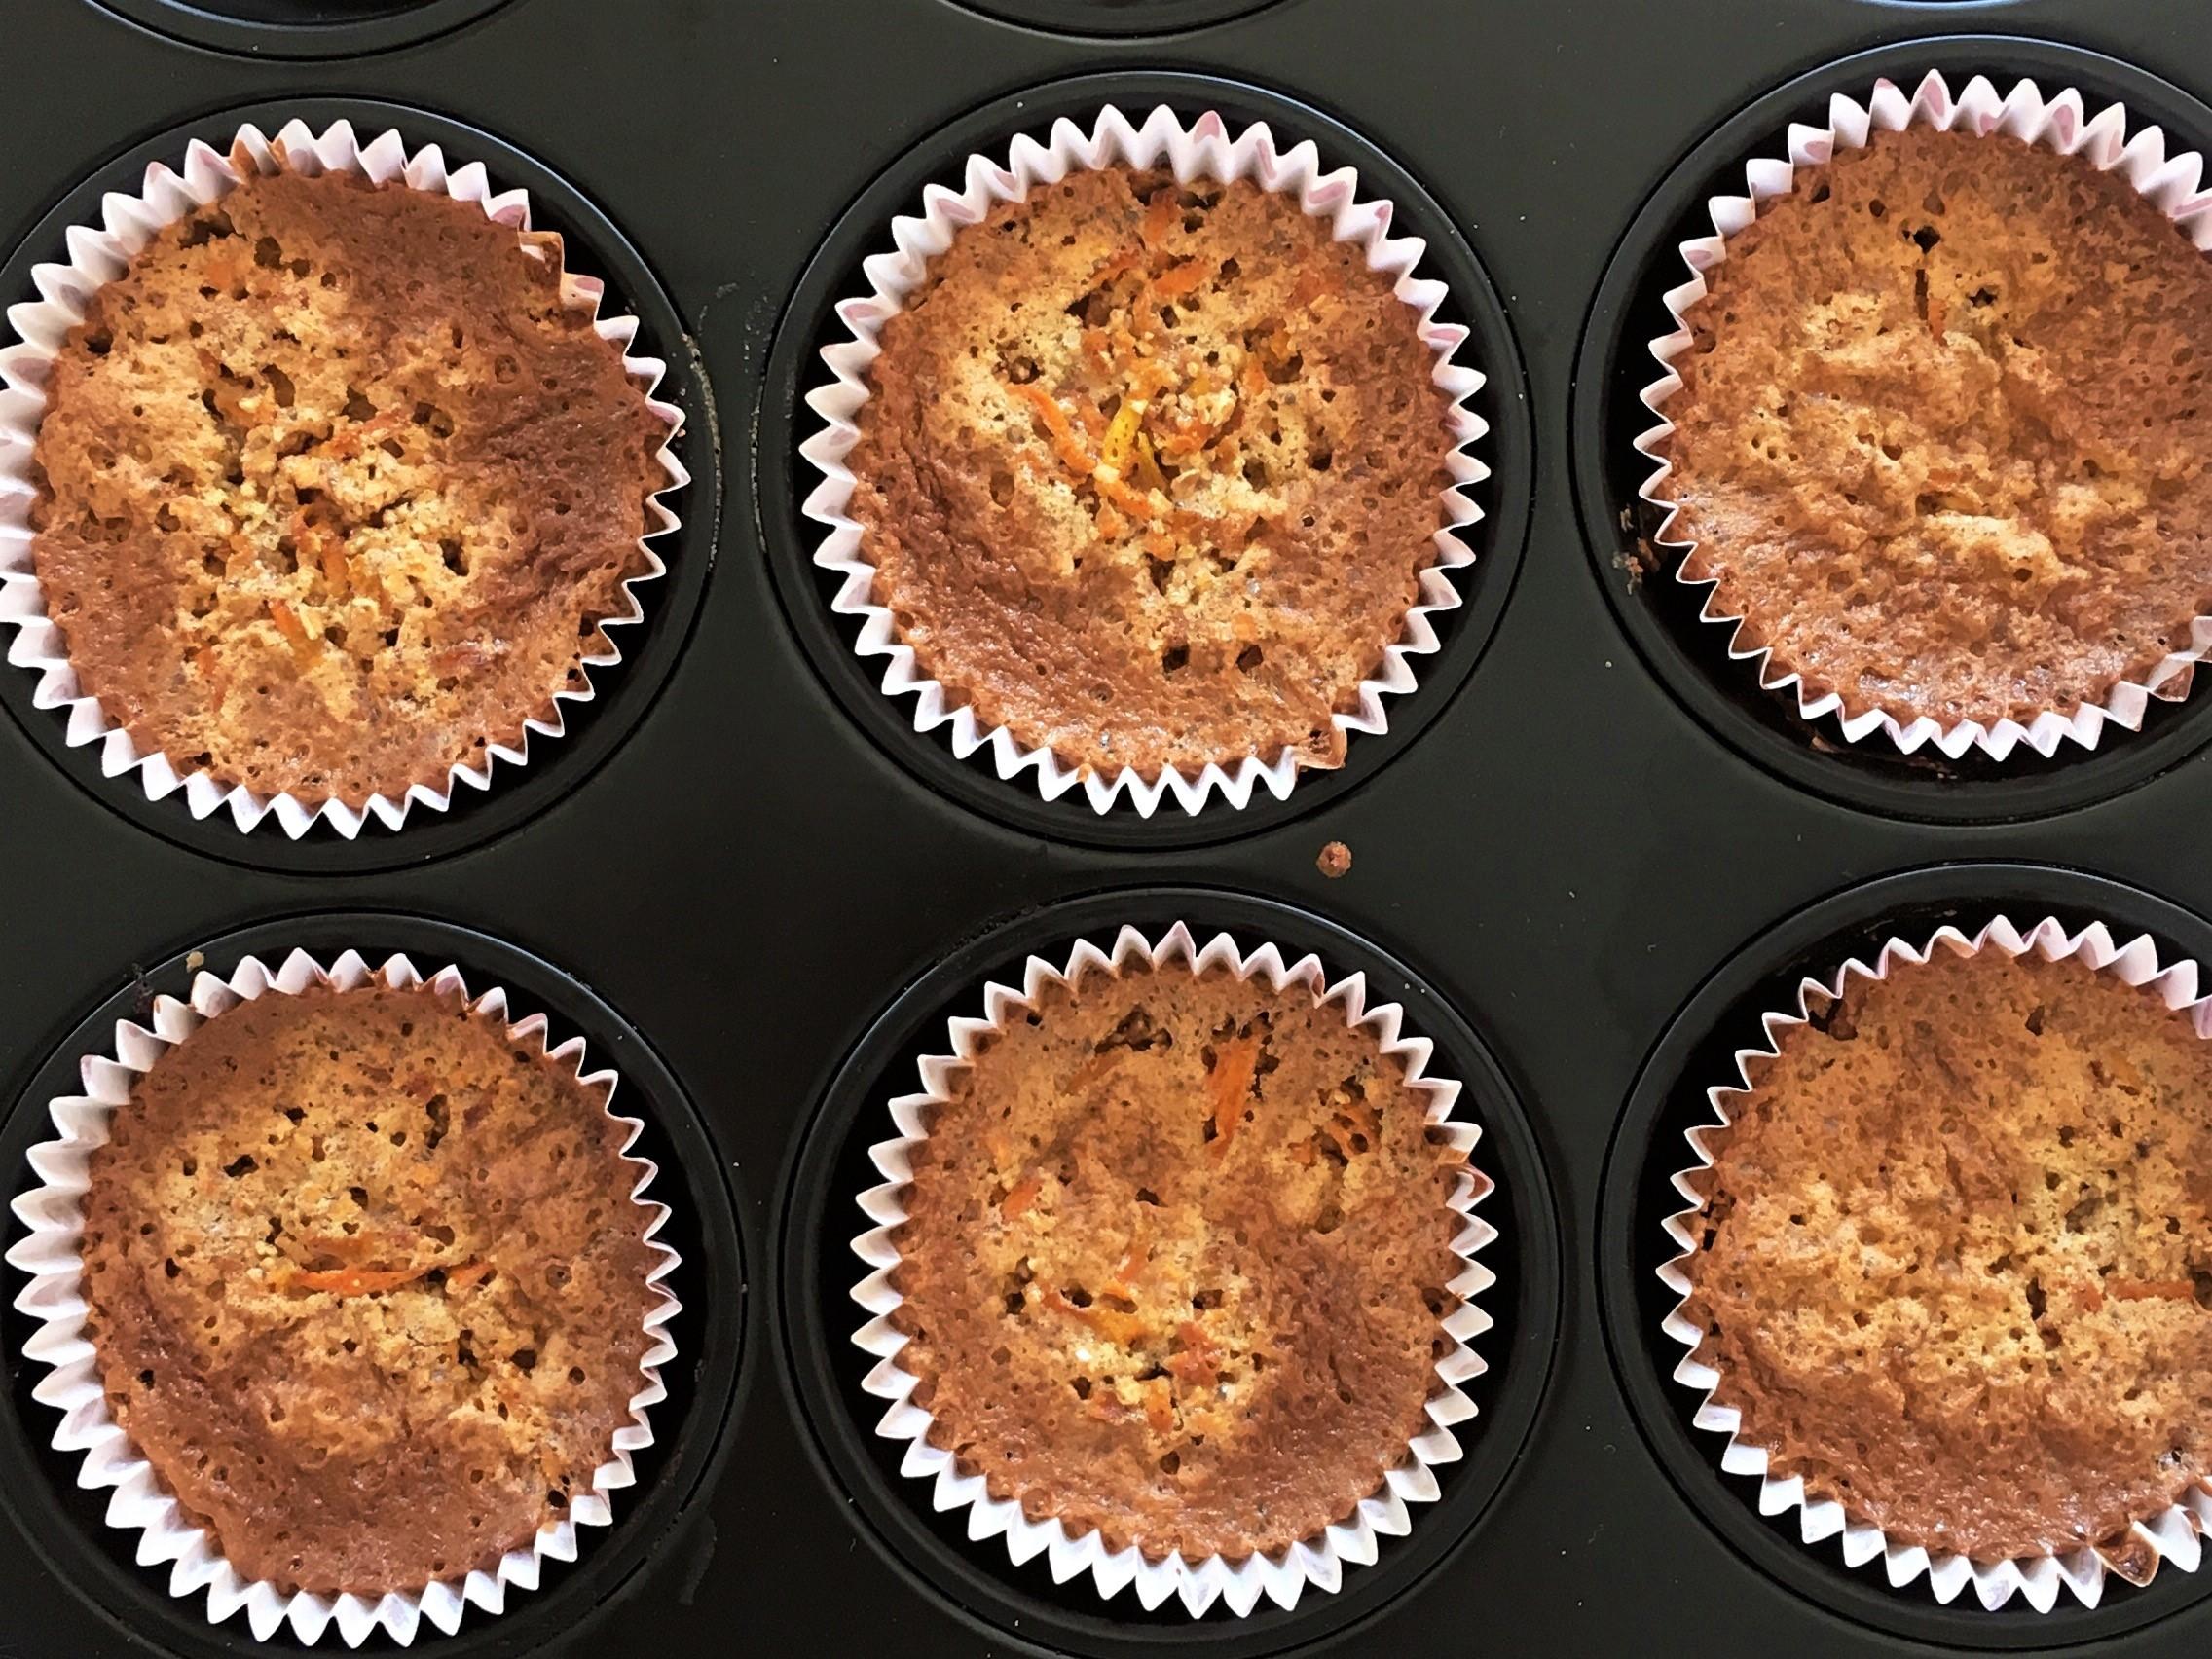 Recept: Proteinrika morotskaksmuffins